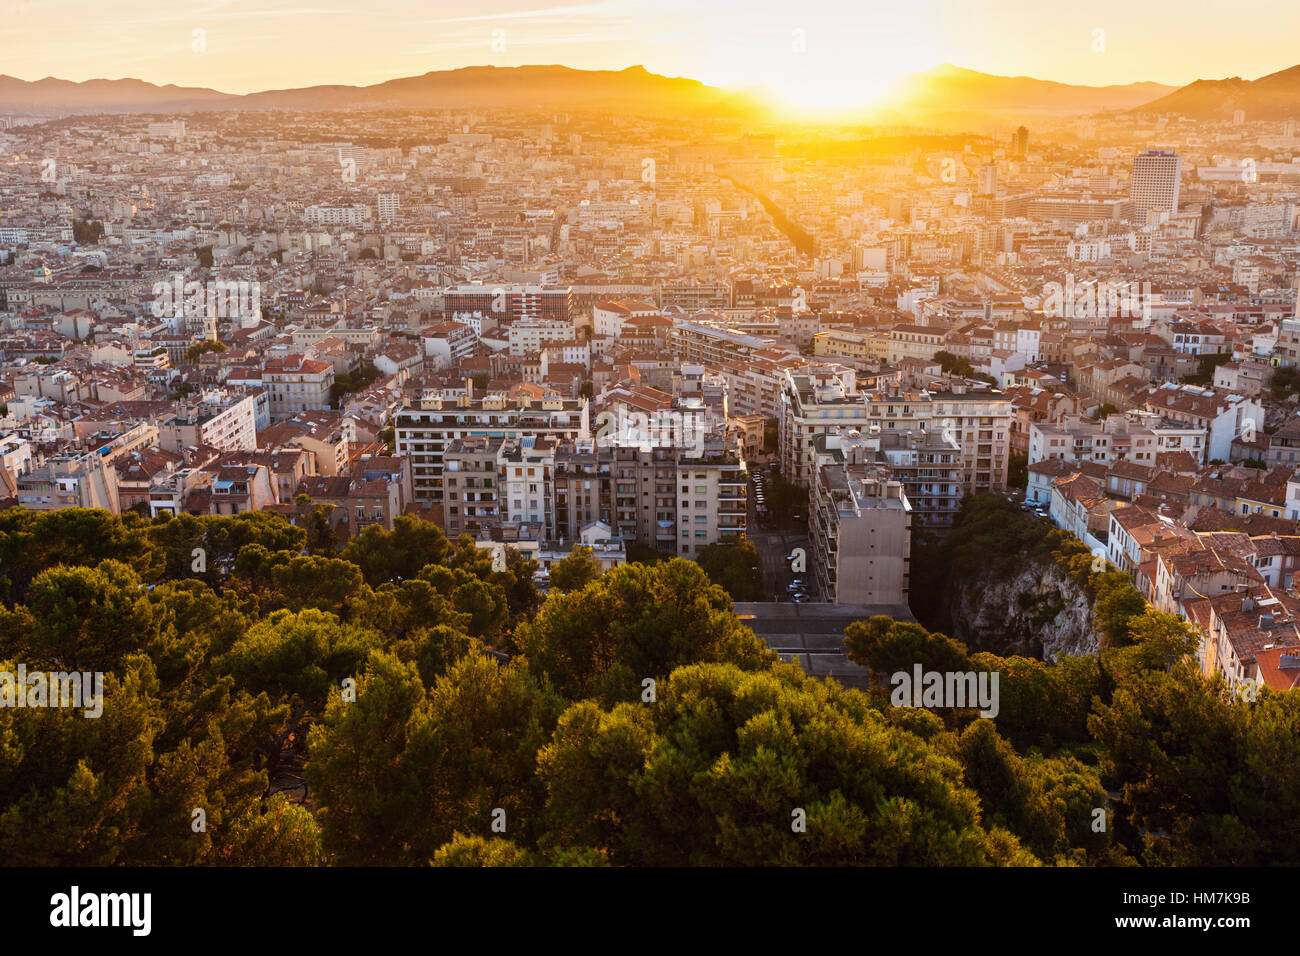 France, Provence-Alpes-Cote d'Azur, Marseille, Cityscape at dusk - Stock Image